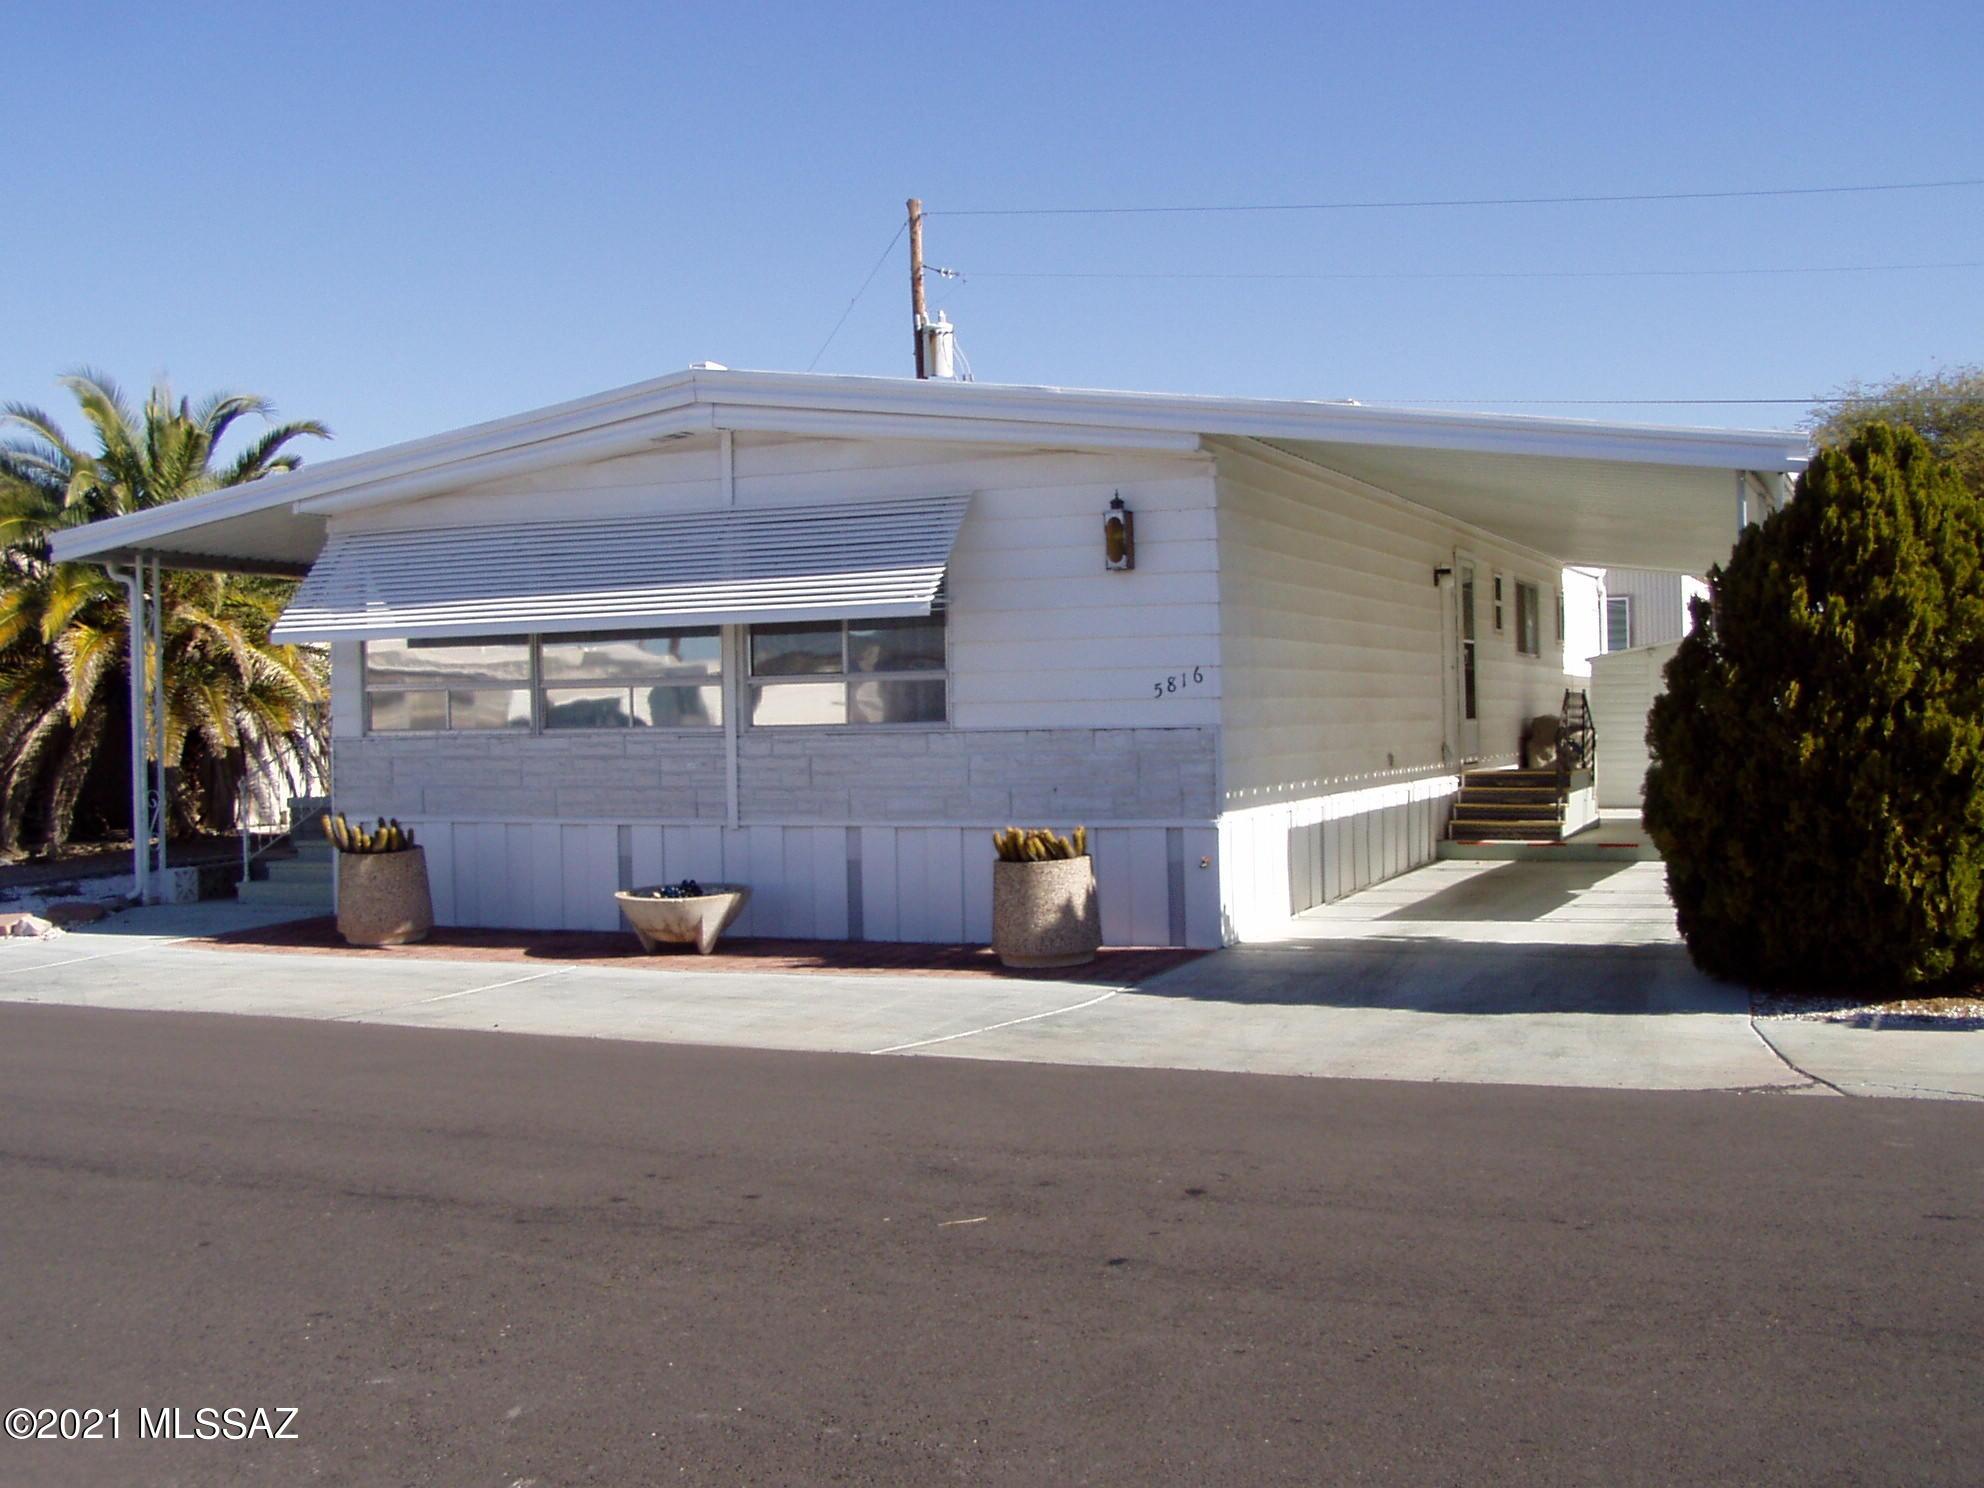 Photo of 5816 W Tumbling F Street, Tucson, AZ 85713